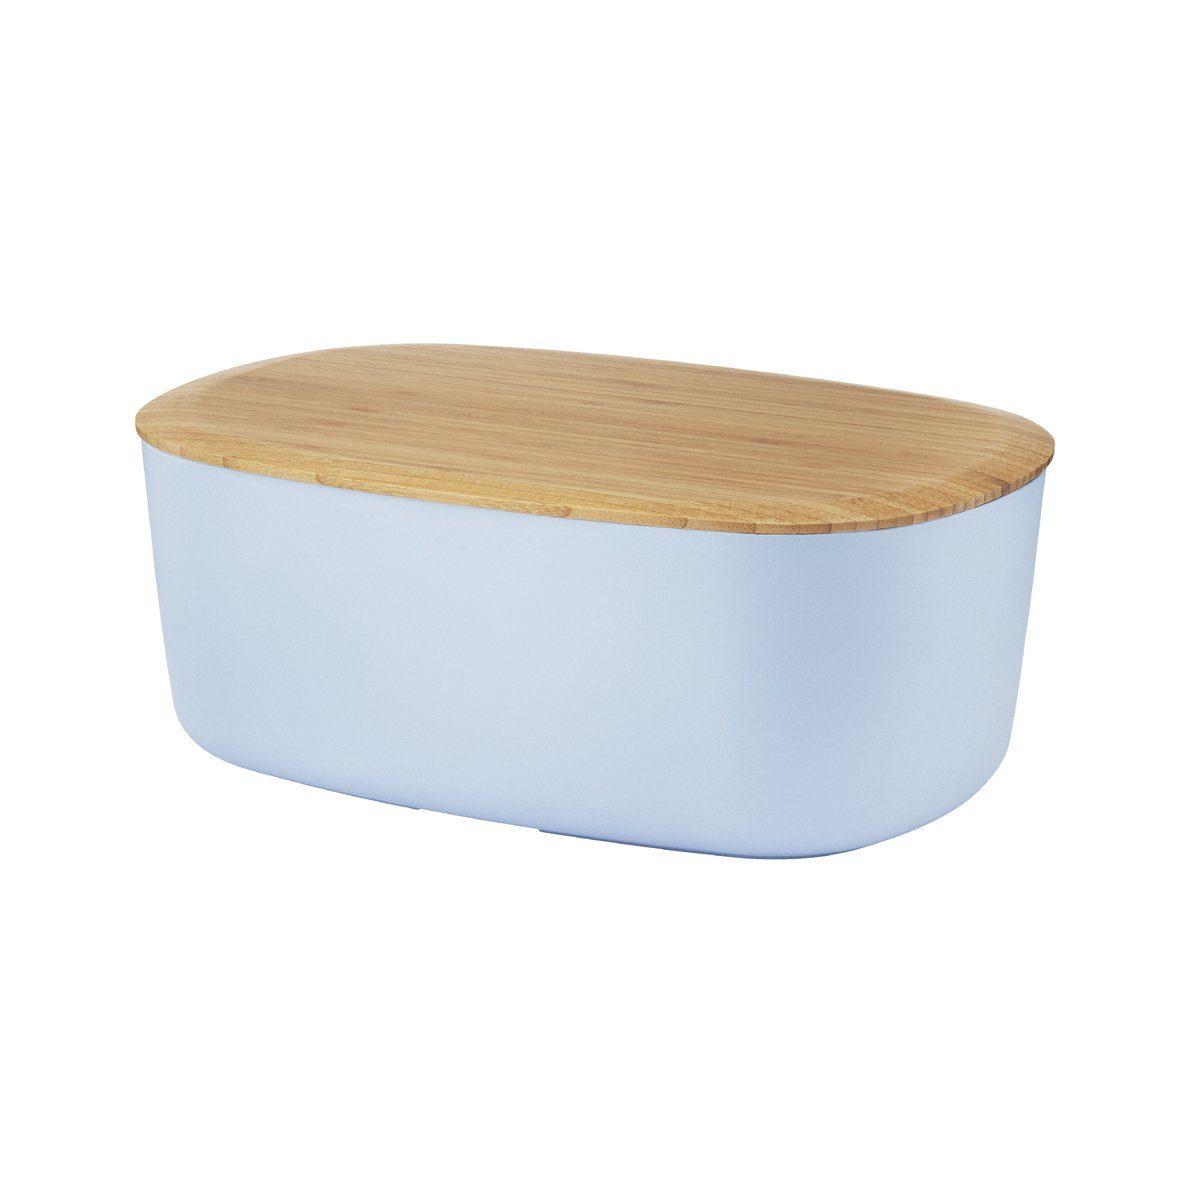 Stelton RIG-TIG Brotkasten BOX-IT hellblau